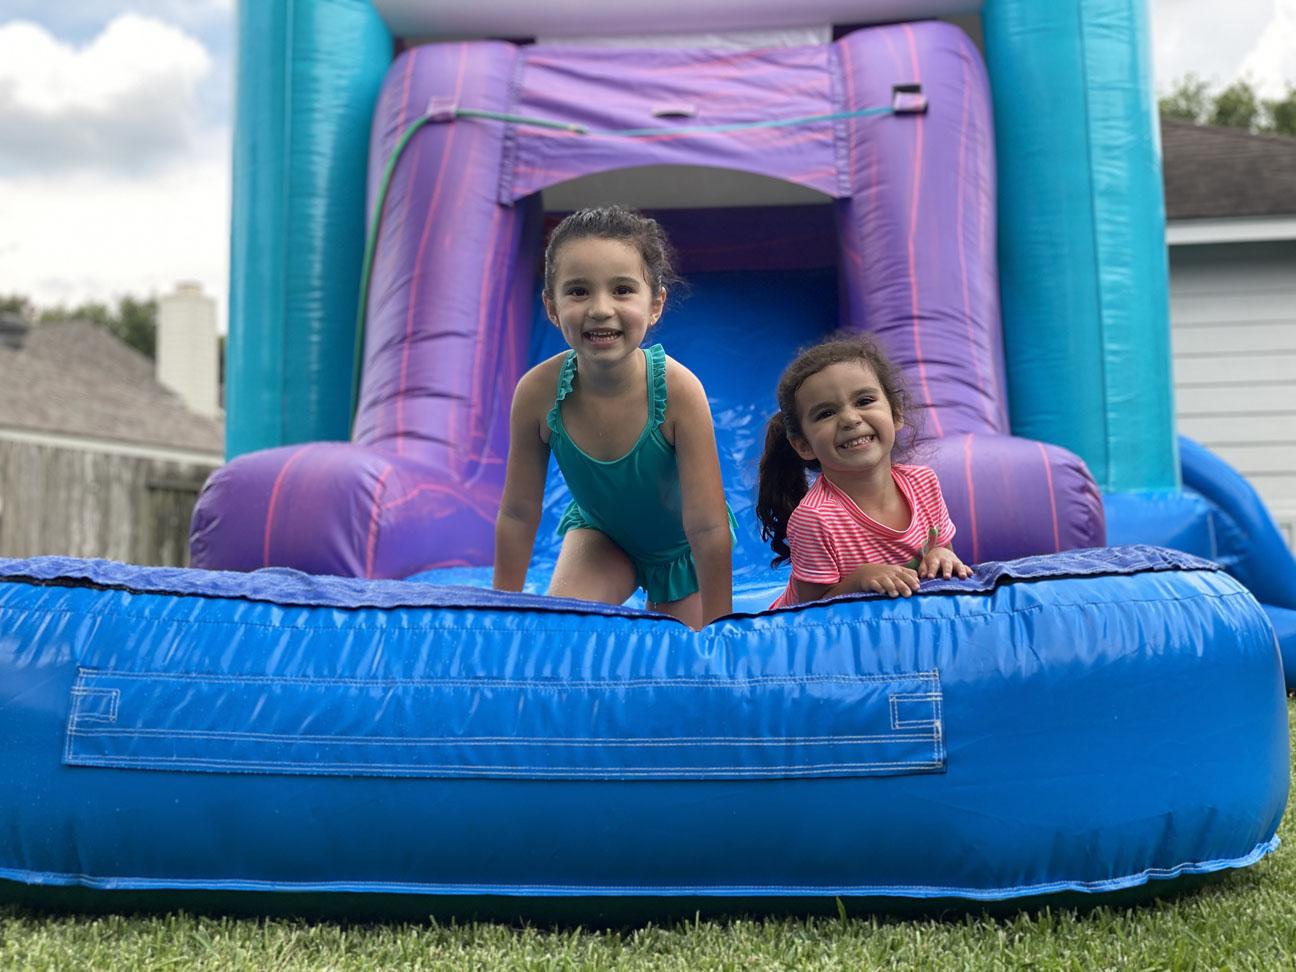 Frozen 2 Bounce House Party Rentals